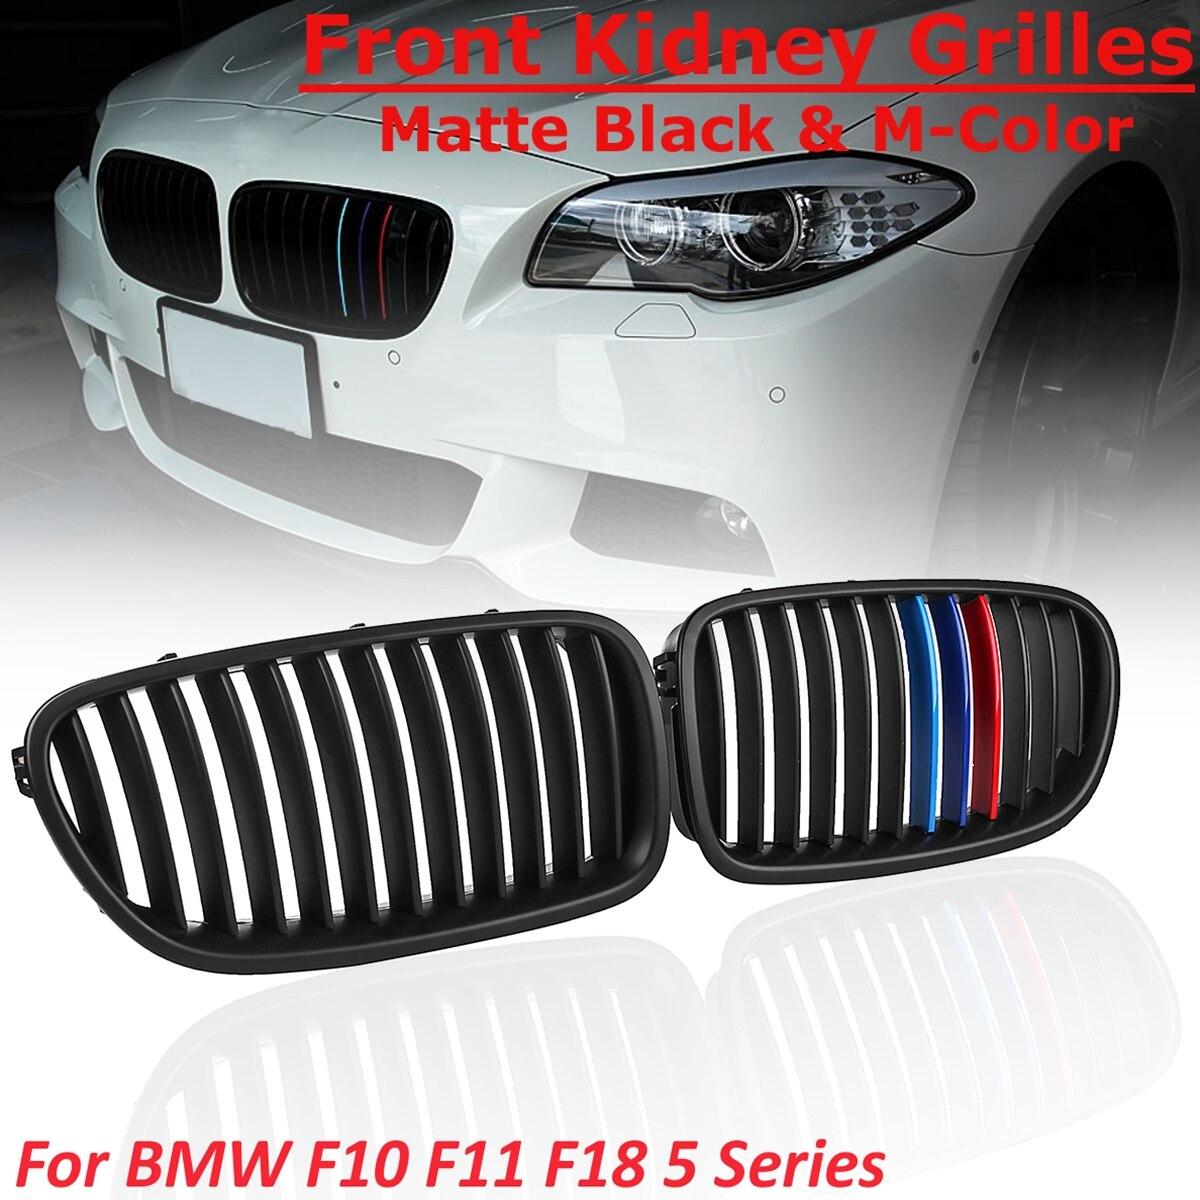 Matte Black 3 Color M Color Front ABS kidney bumper grille Grilles for BMW F10 F11 F18 M5 5 Series 2010 2011 2012 2013 2014 3pcs set m color front grill bumper cover trim decoration strip sticker for bmw 5 series f10 f11 2011 2013 f10 f18 2014 2015